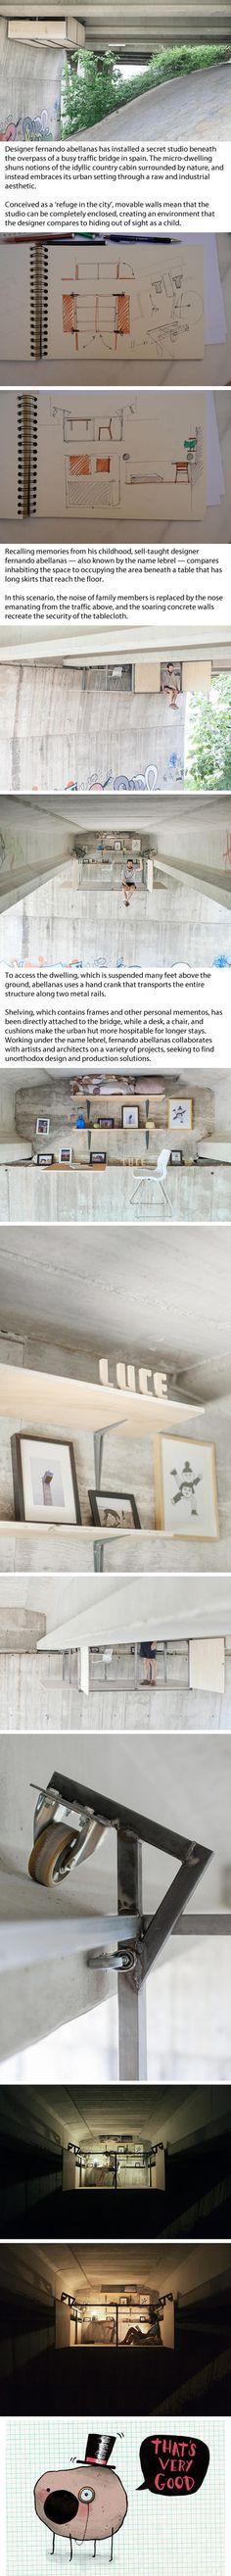 Spanish Designer Builds A Secret Studio Beneath A Busy Bridge In Valencia